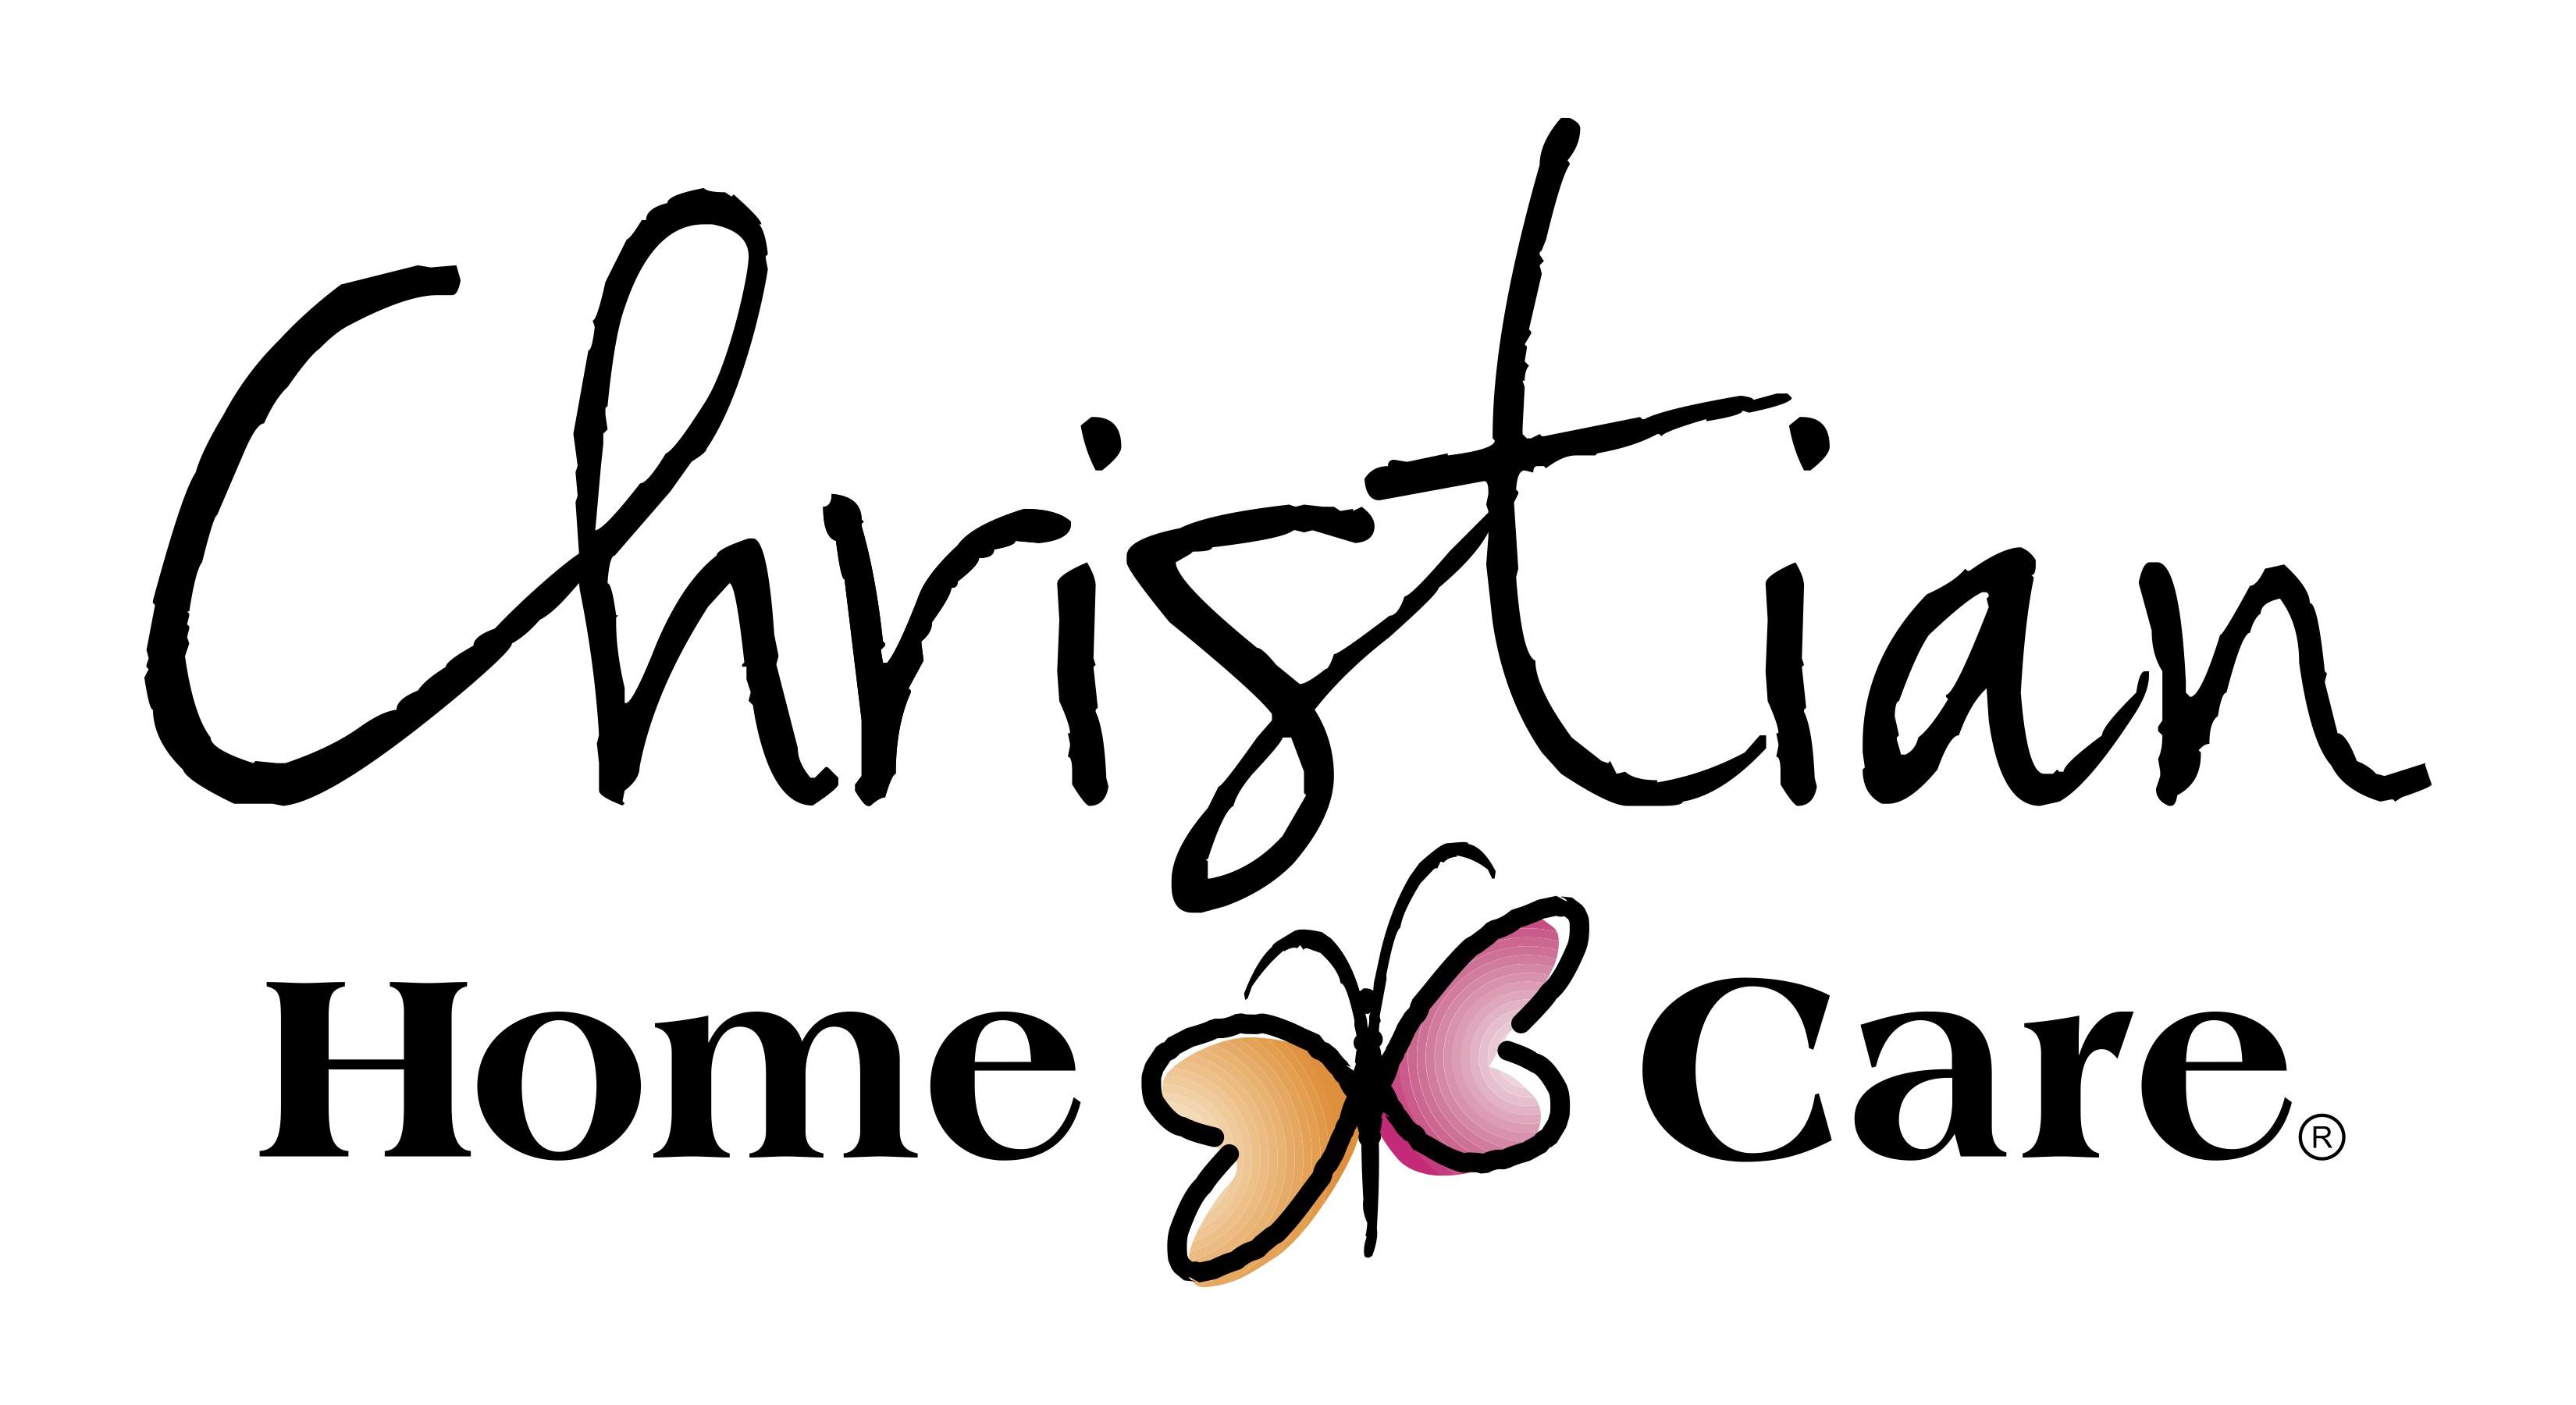 Christian Home Care LLC logo